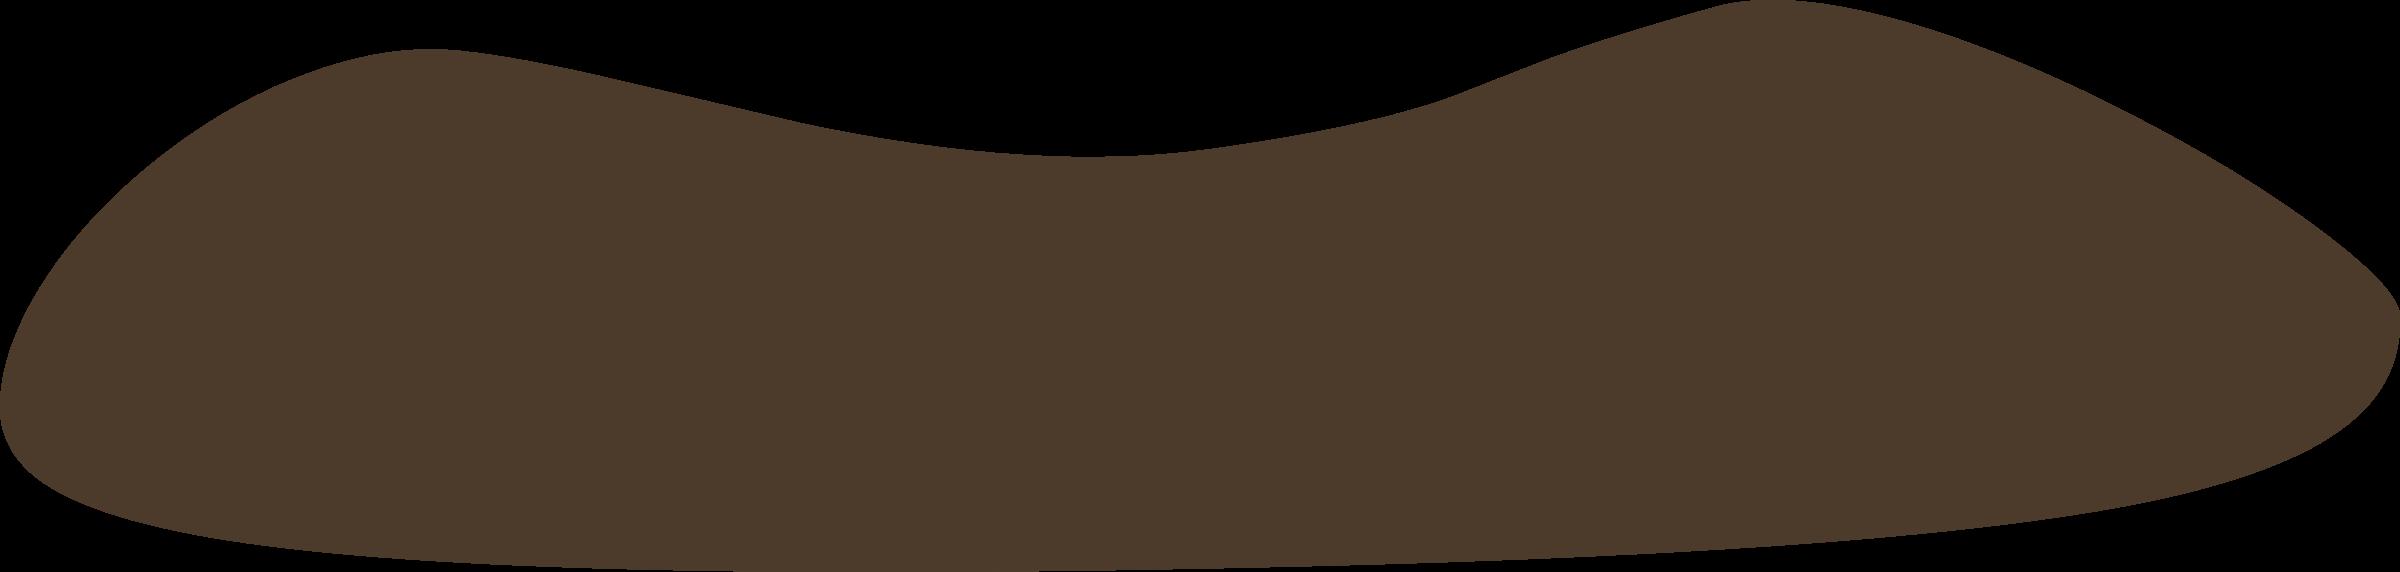 BIG IMAGE (PNG) - Spotless PNG